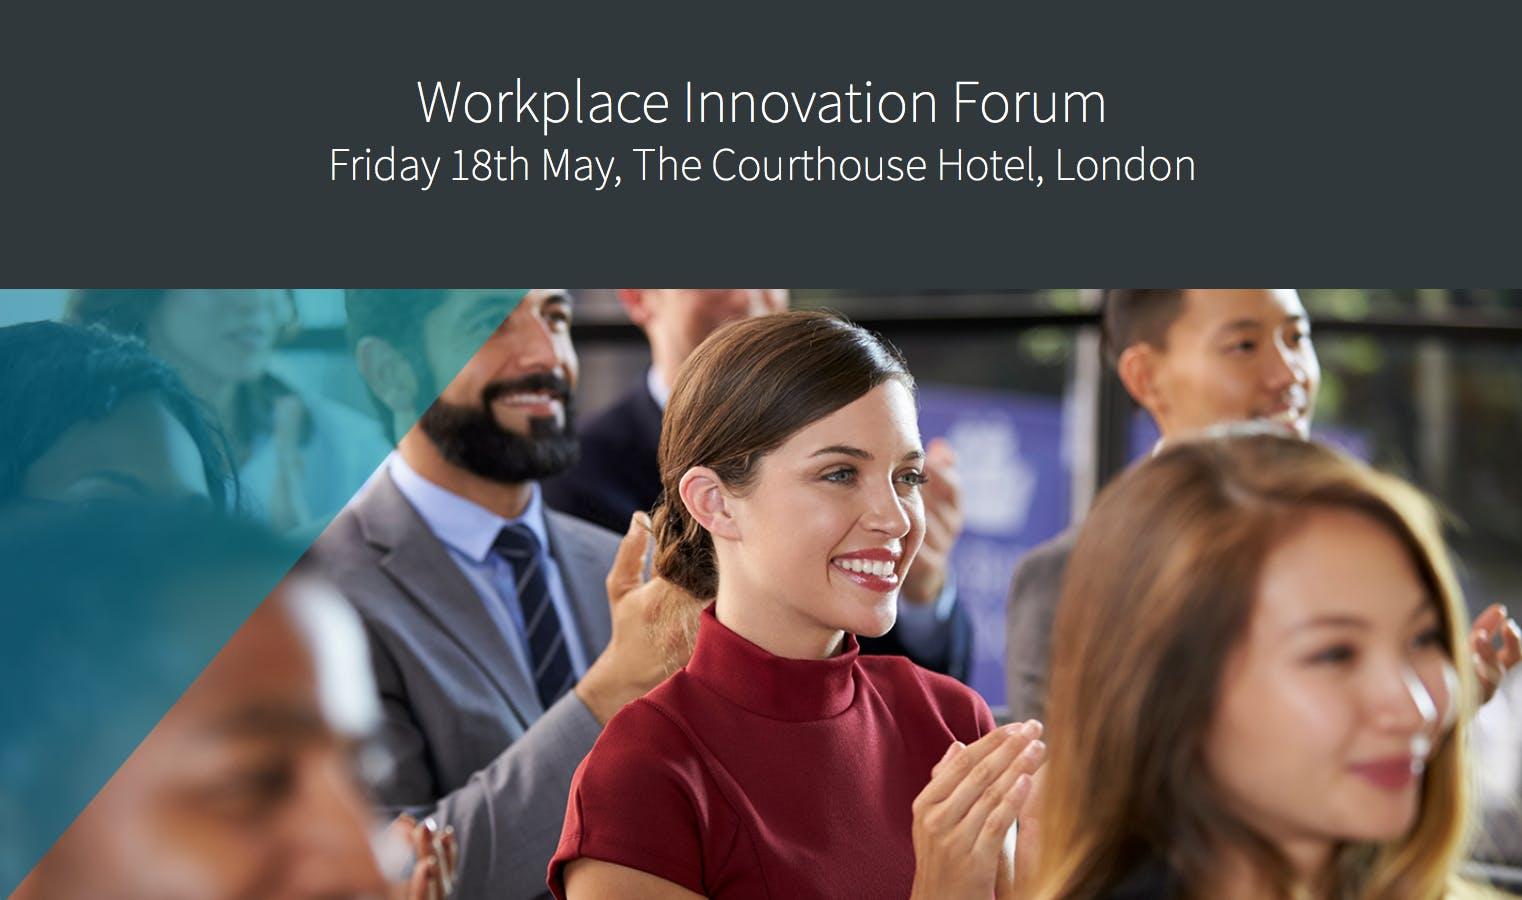 Workplace Innovation Forum